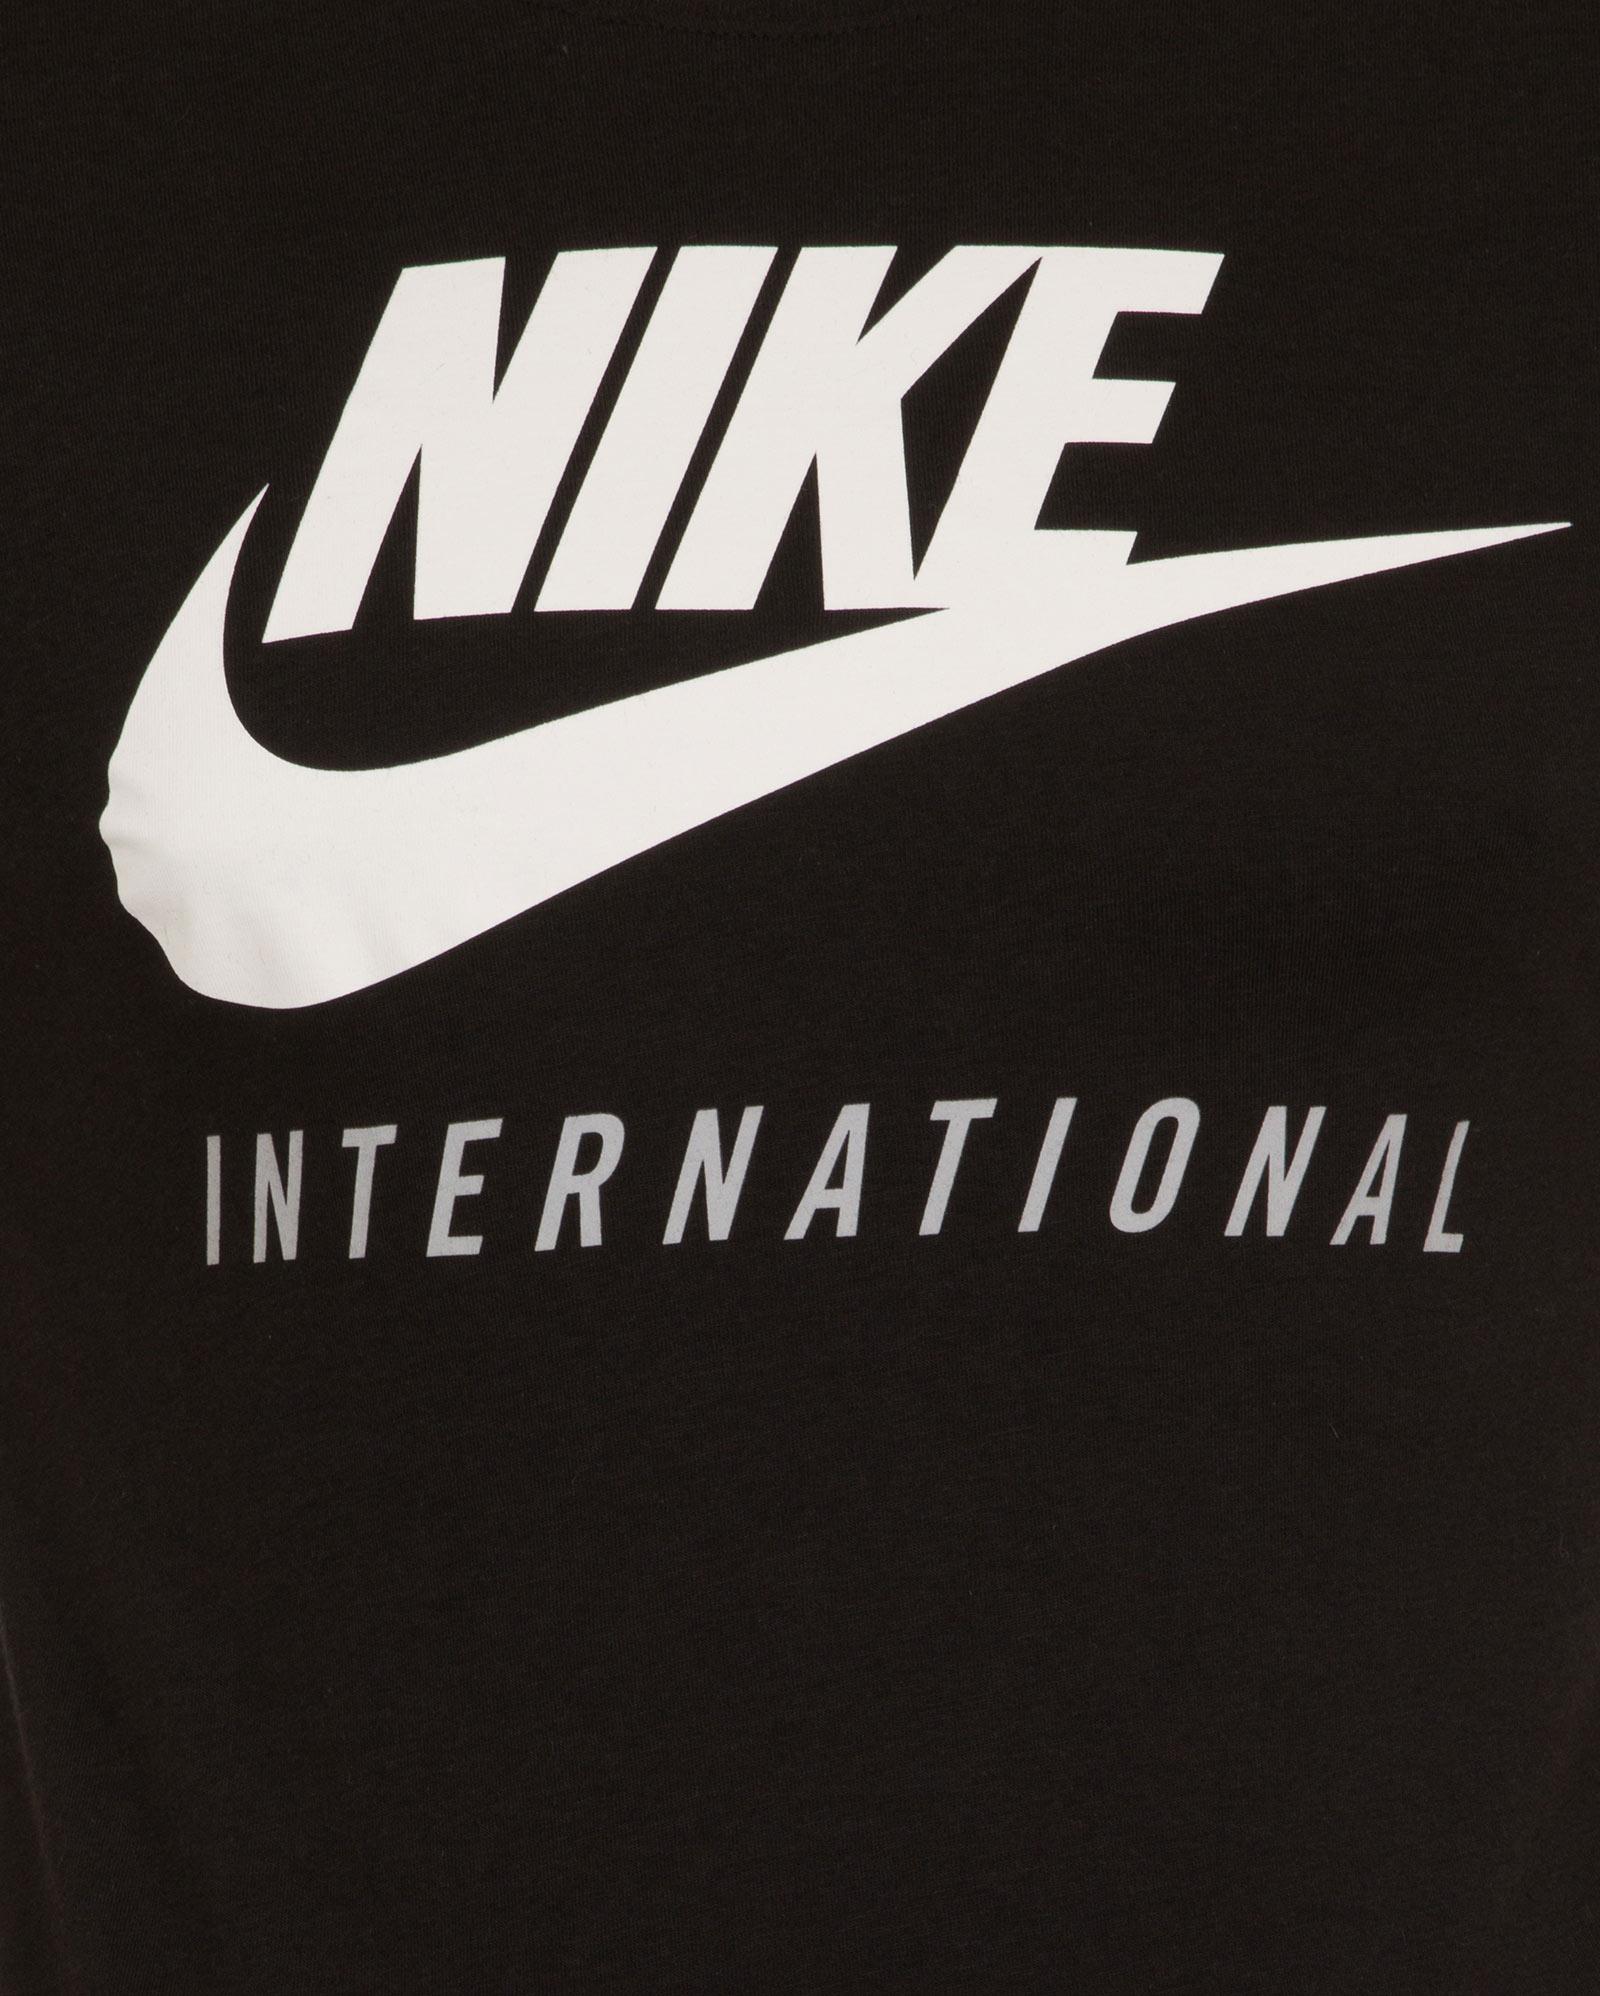 new nike international logo mens t shirt all sizes ebay. Black Bedroom Furniture Sets. Home Design Ideas